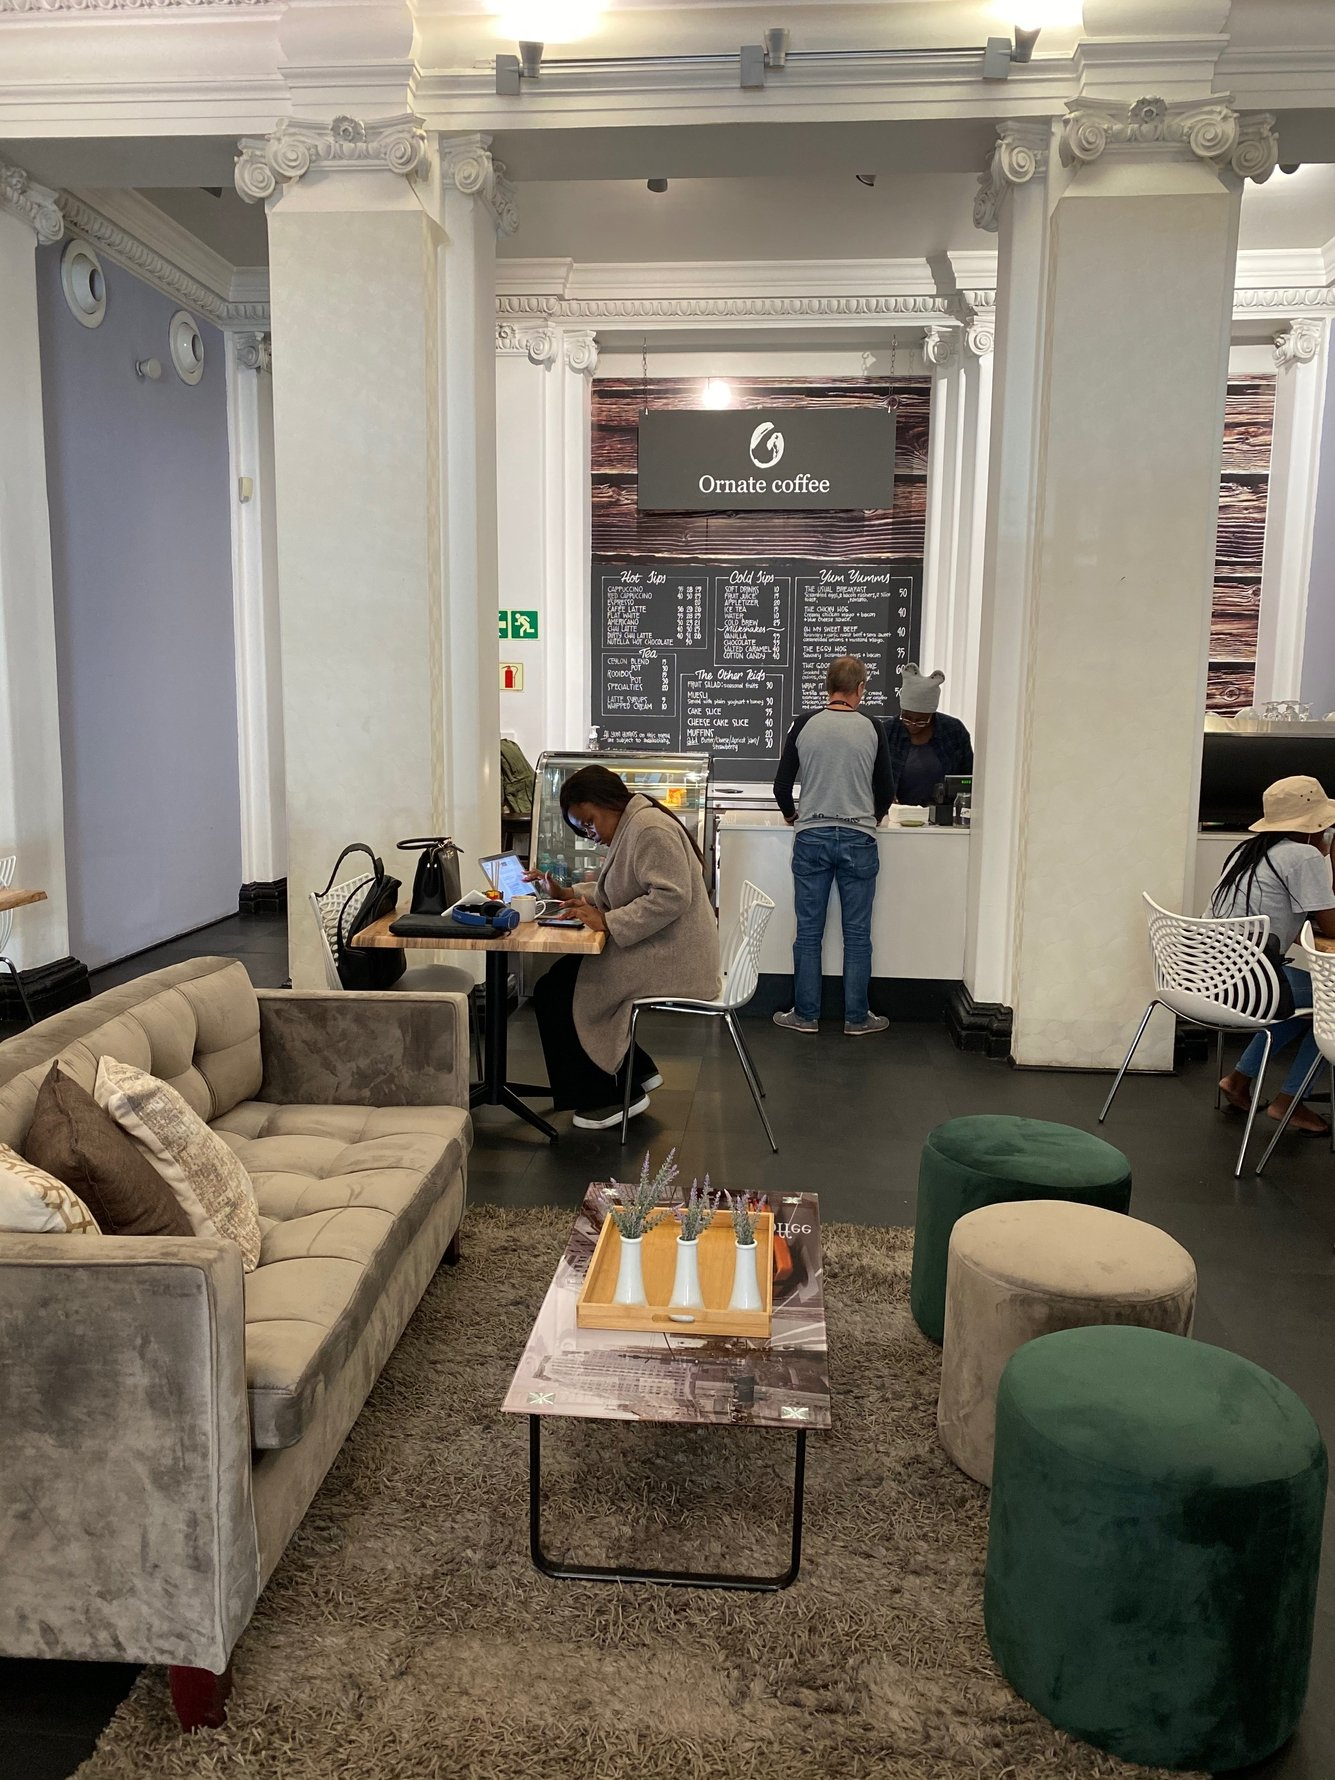 Inside Ornate Cafe